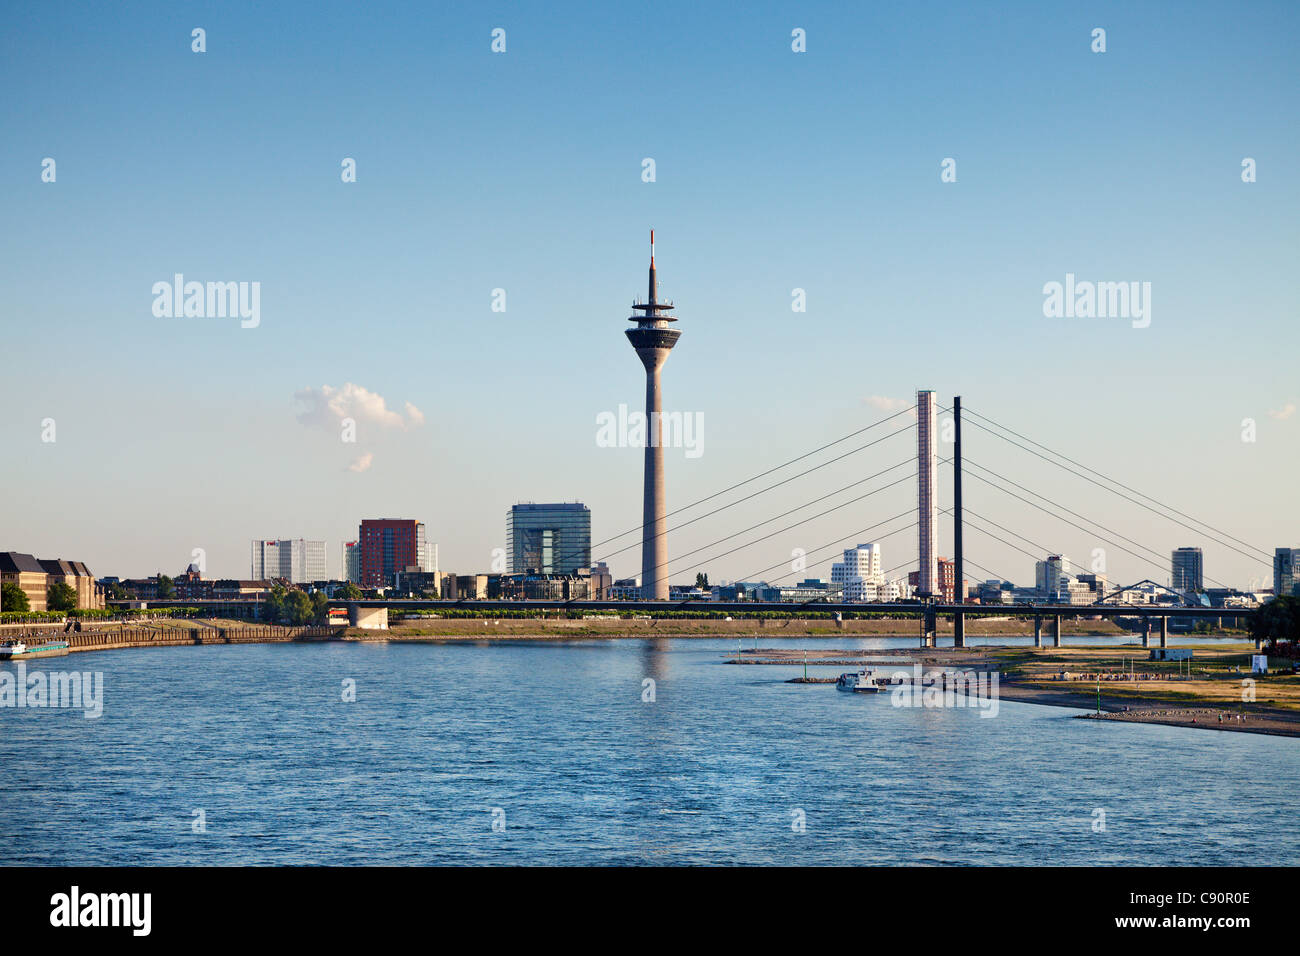 River Rhein and Media Harbour, Duesseldorf, Duesseldorf, North Rhine-Westphalia, Germany, Europe Stock Photo